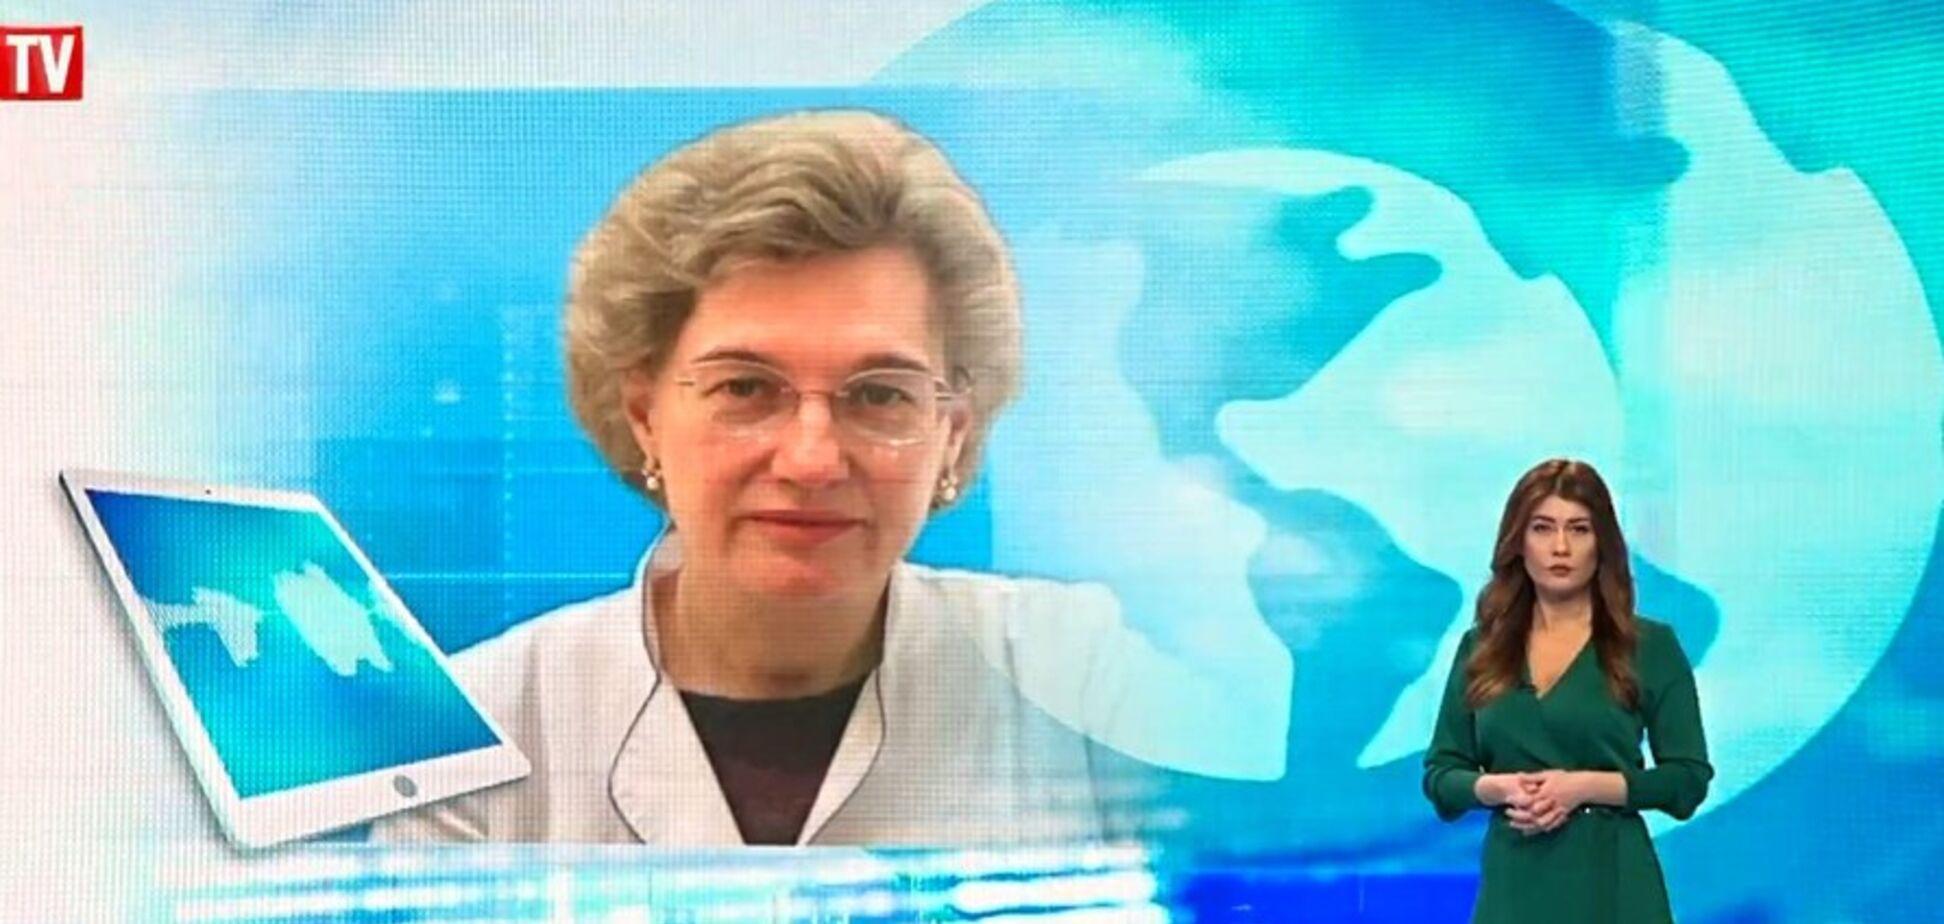 'Корь помните?!' Врач МОЗ предупредила, что Украина не готова к атаке коронавируса